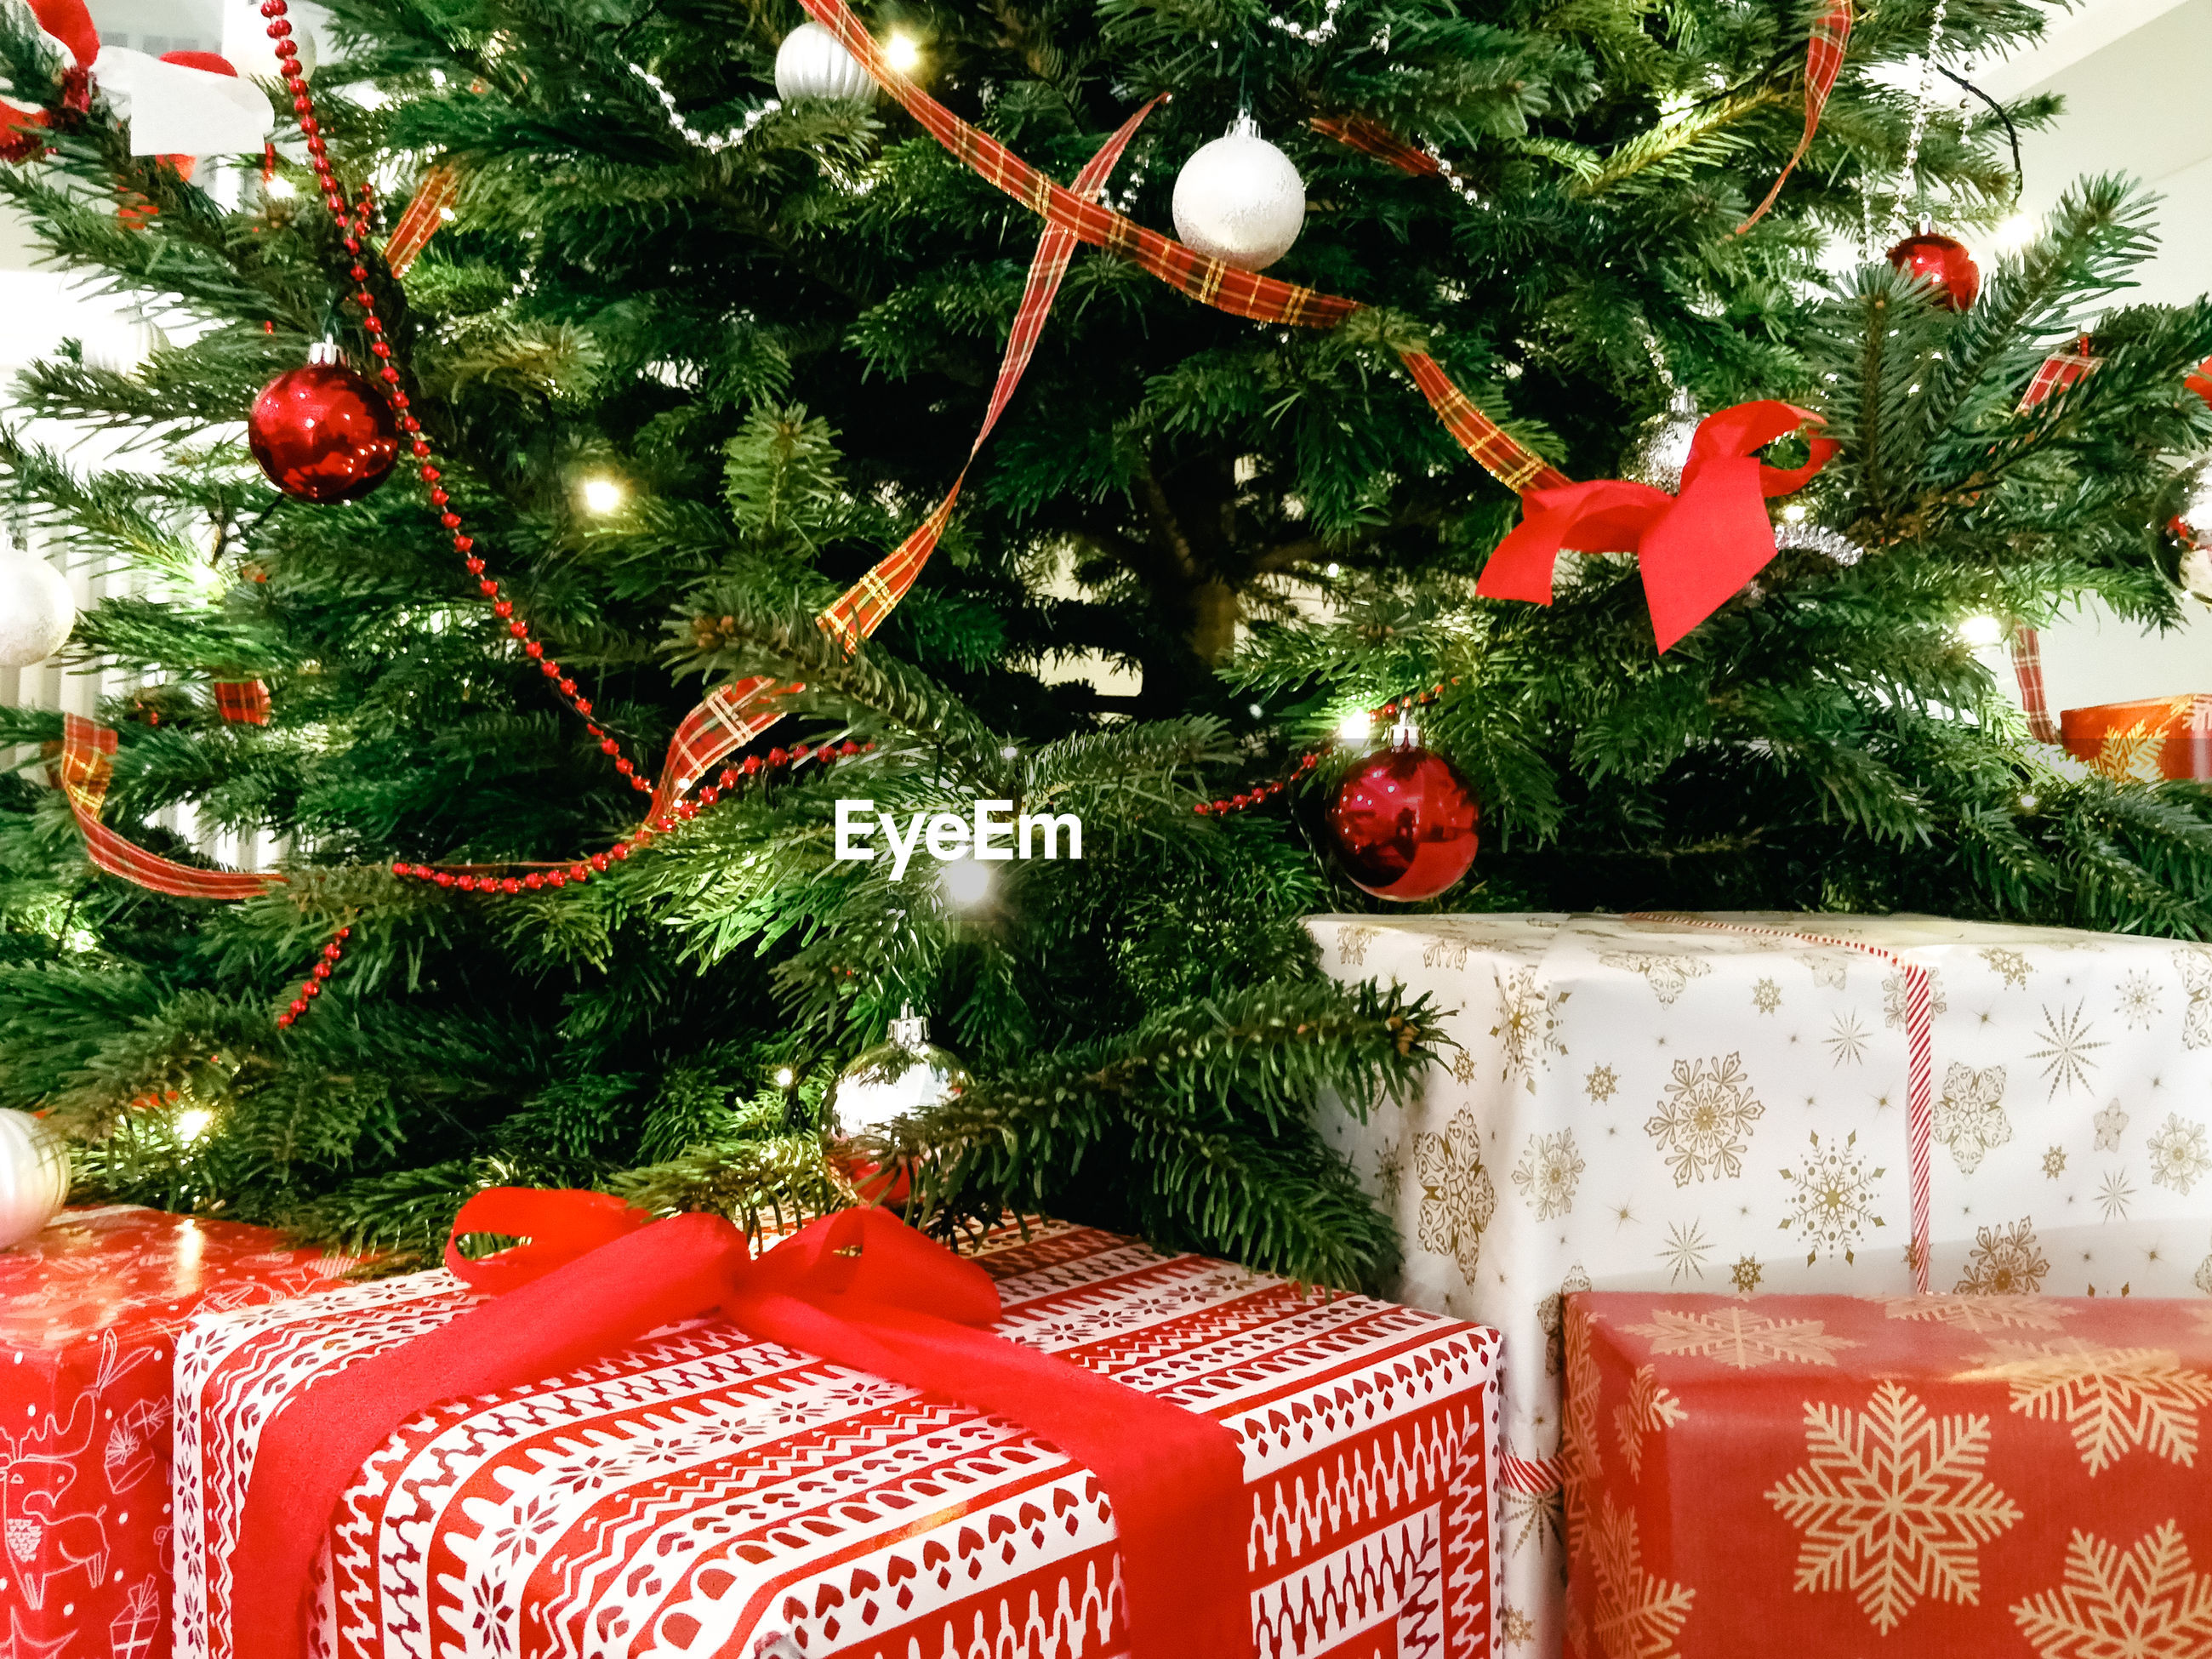 Christmas presents and decoration hanging on christmas tree